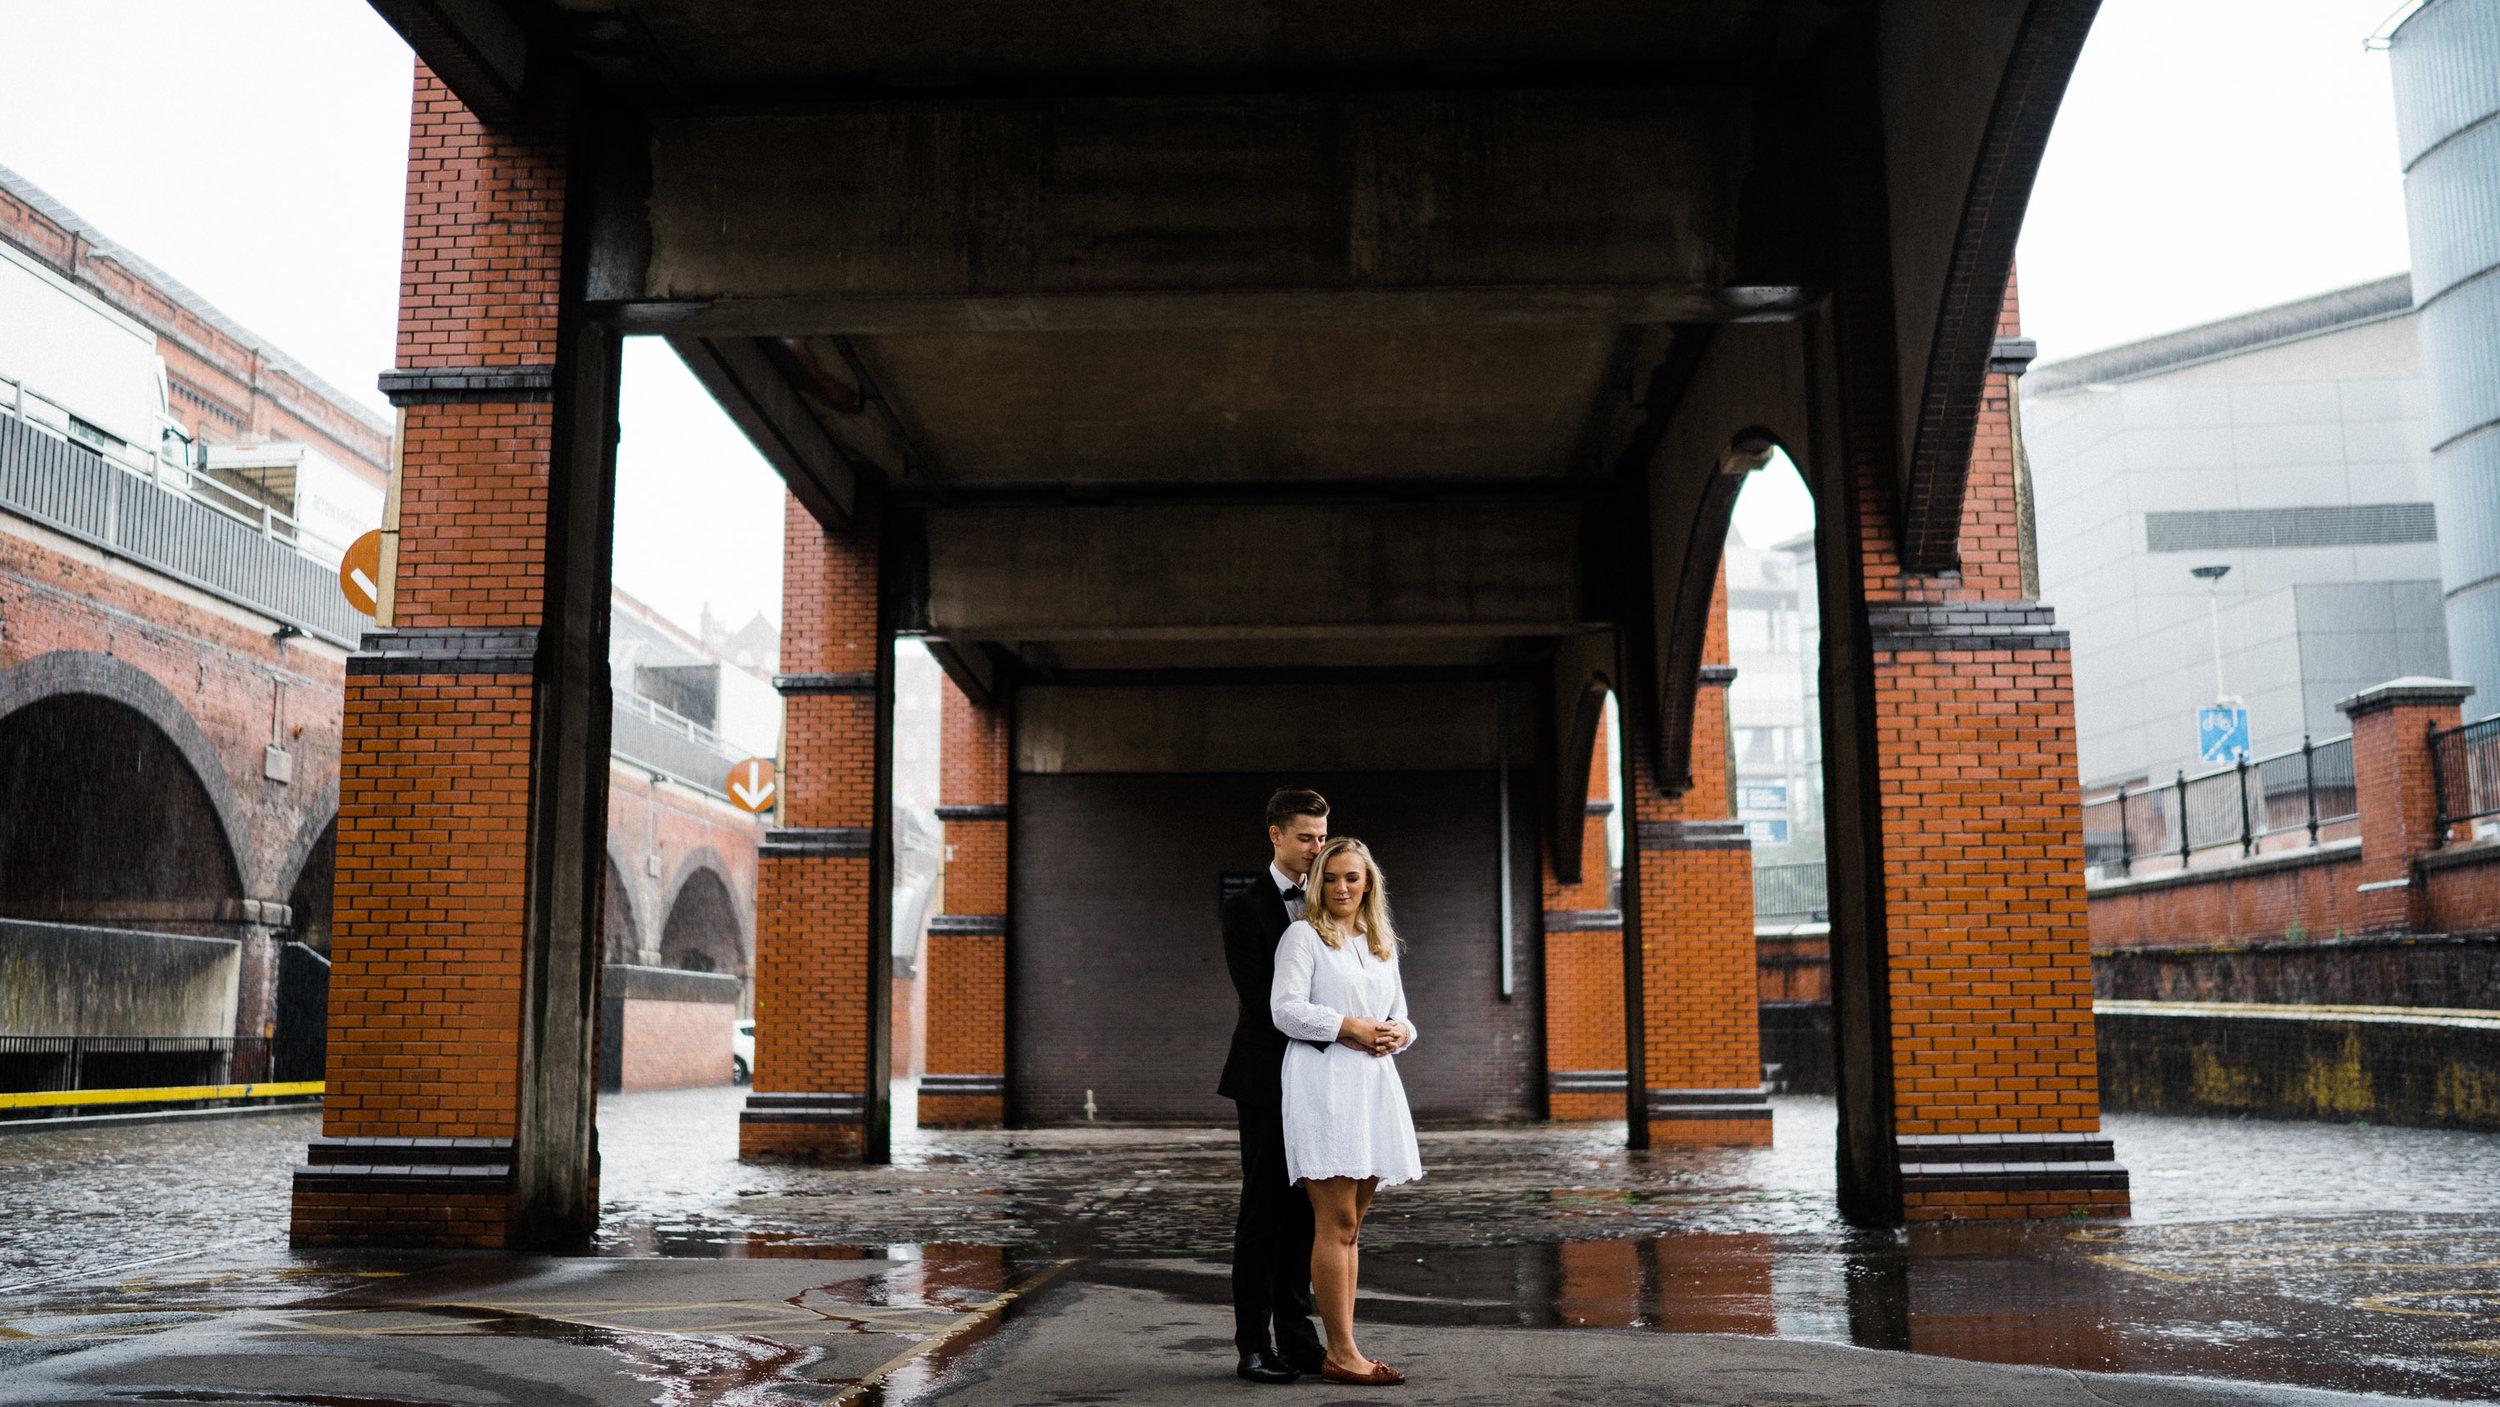 www.bytomw.com - Tom Wright - Manchester & Lake District Wedding Photographer -01006.jpg